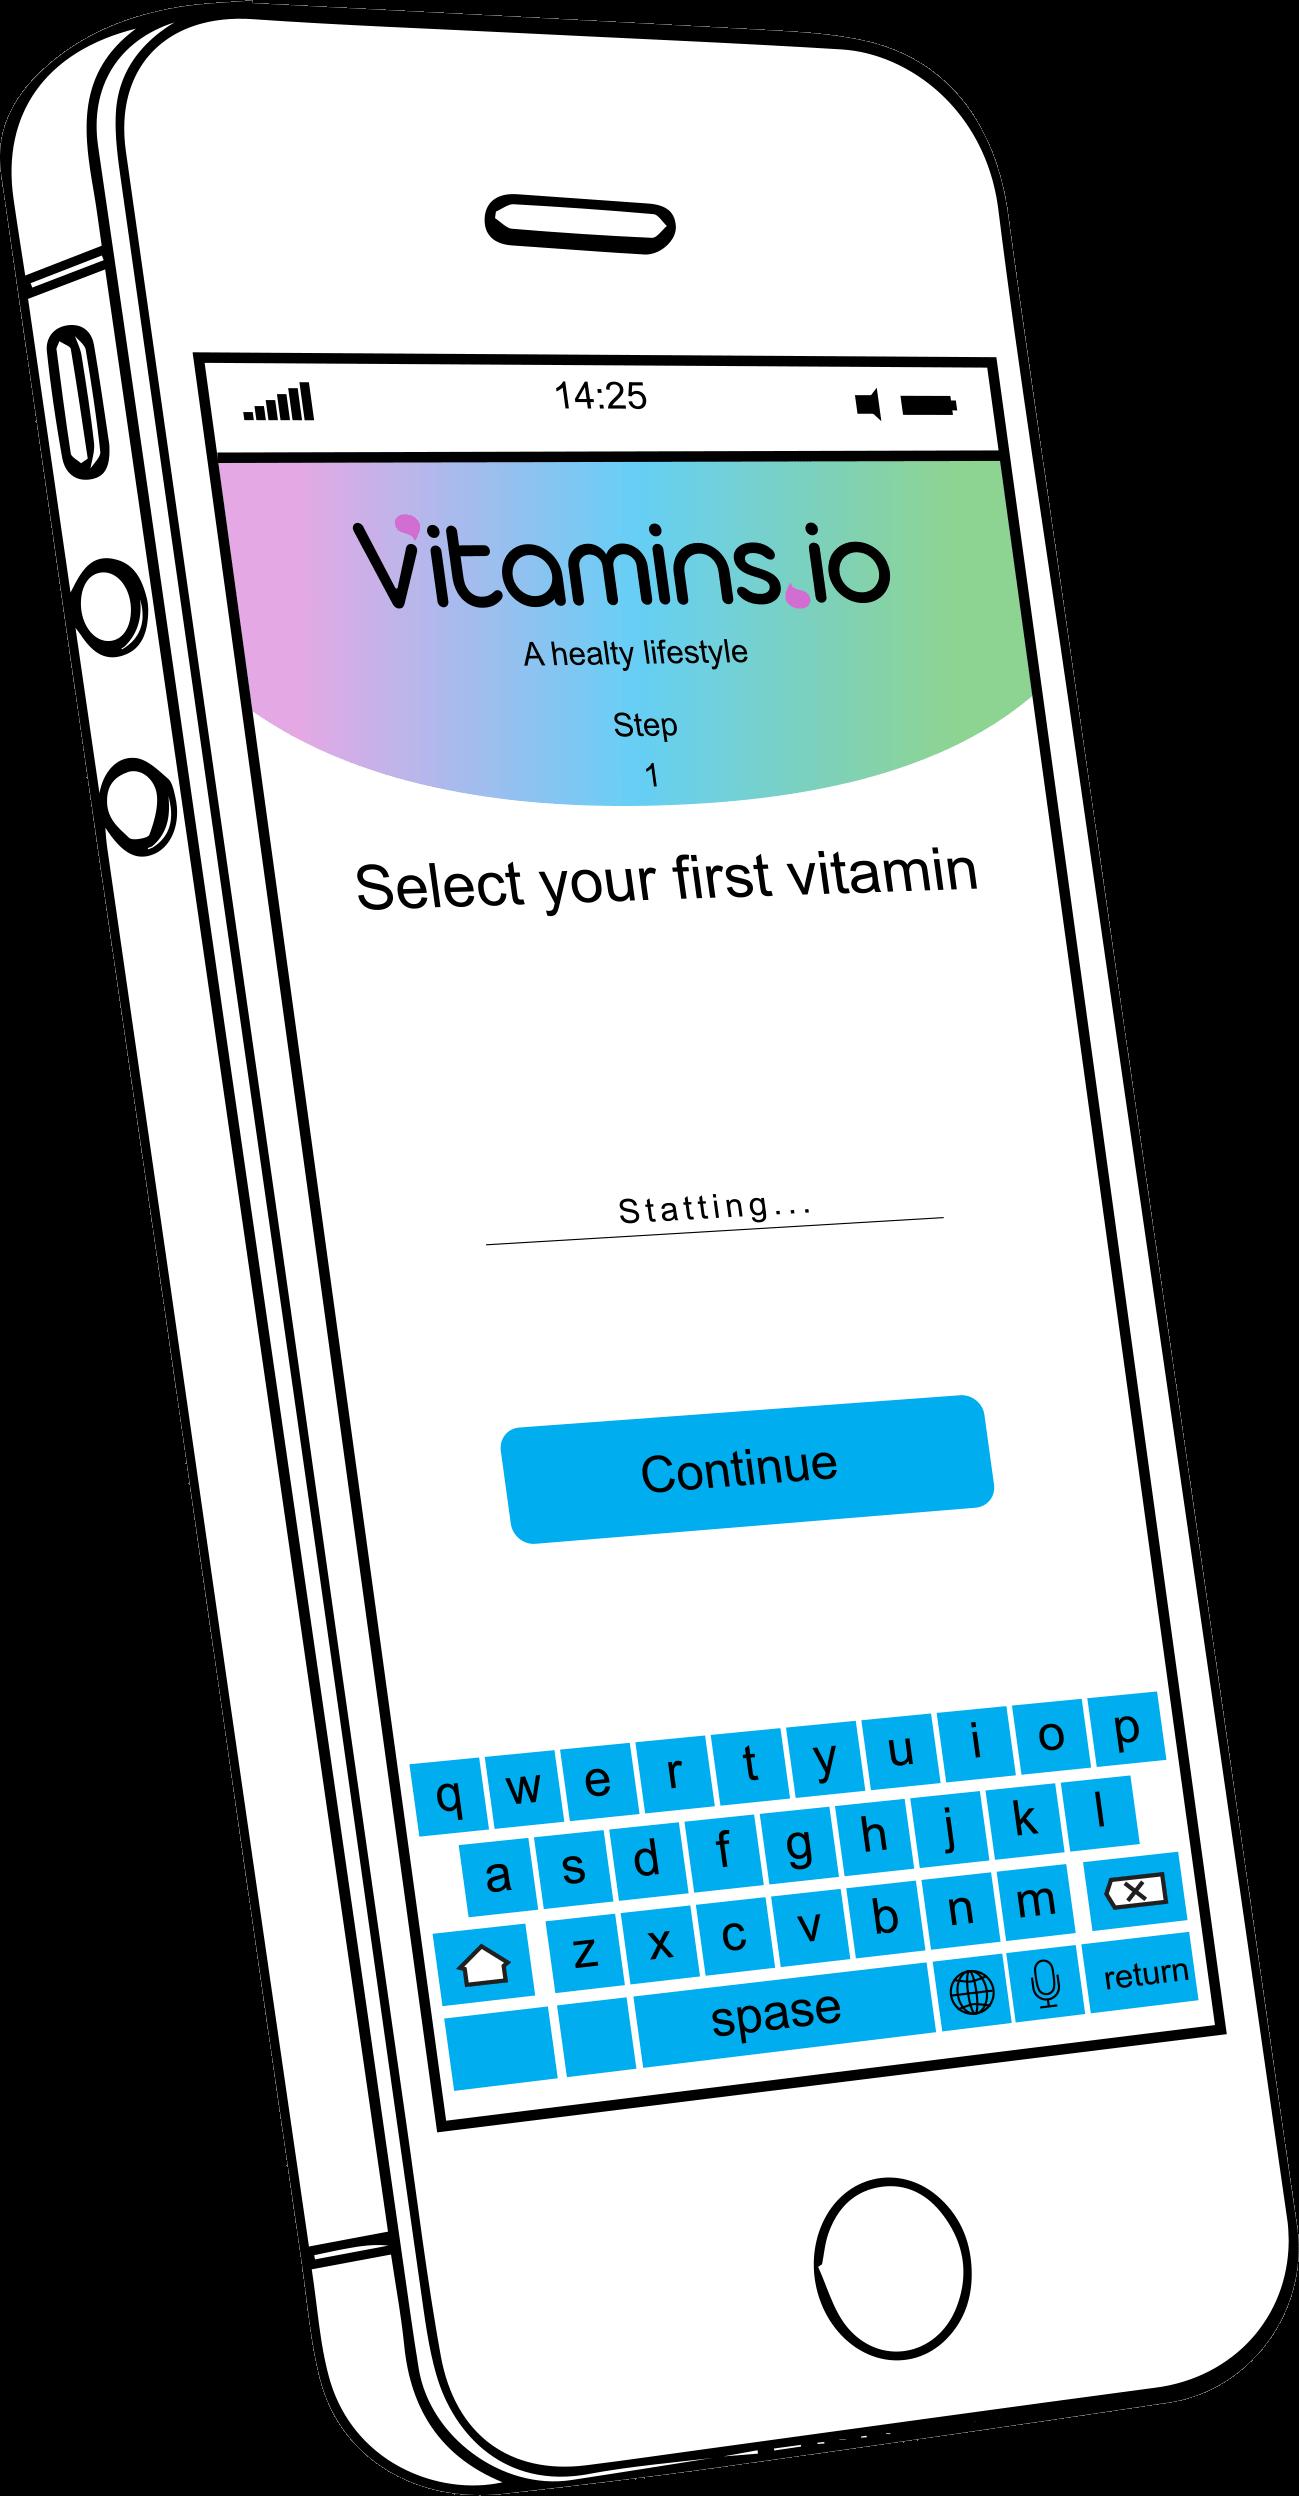 Vitamins.io mobile app